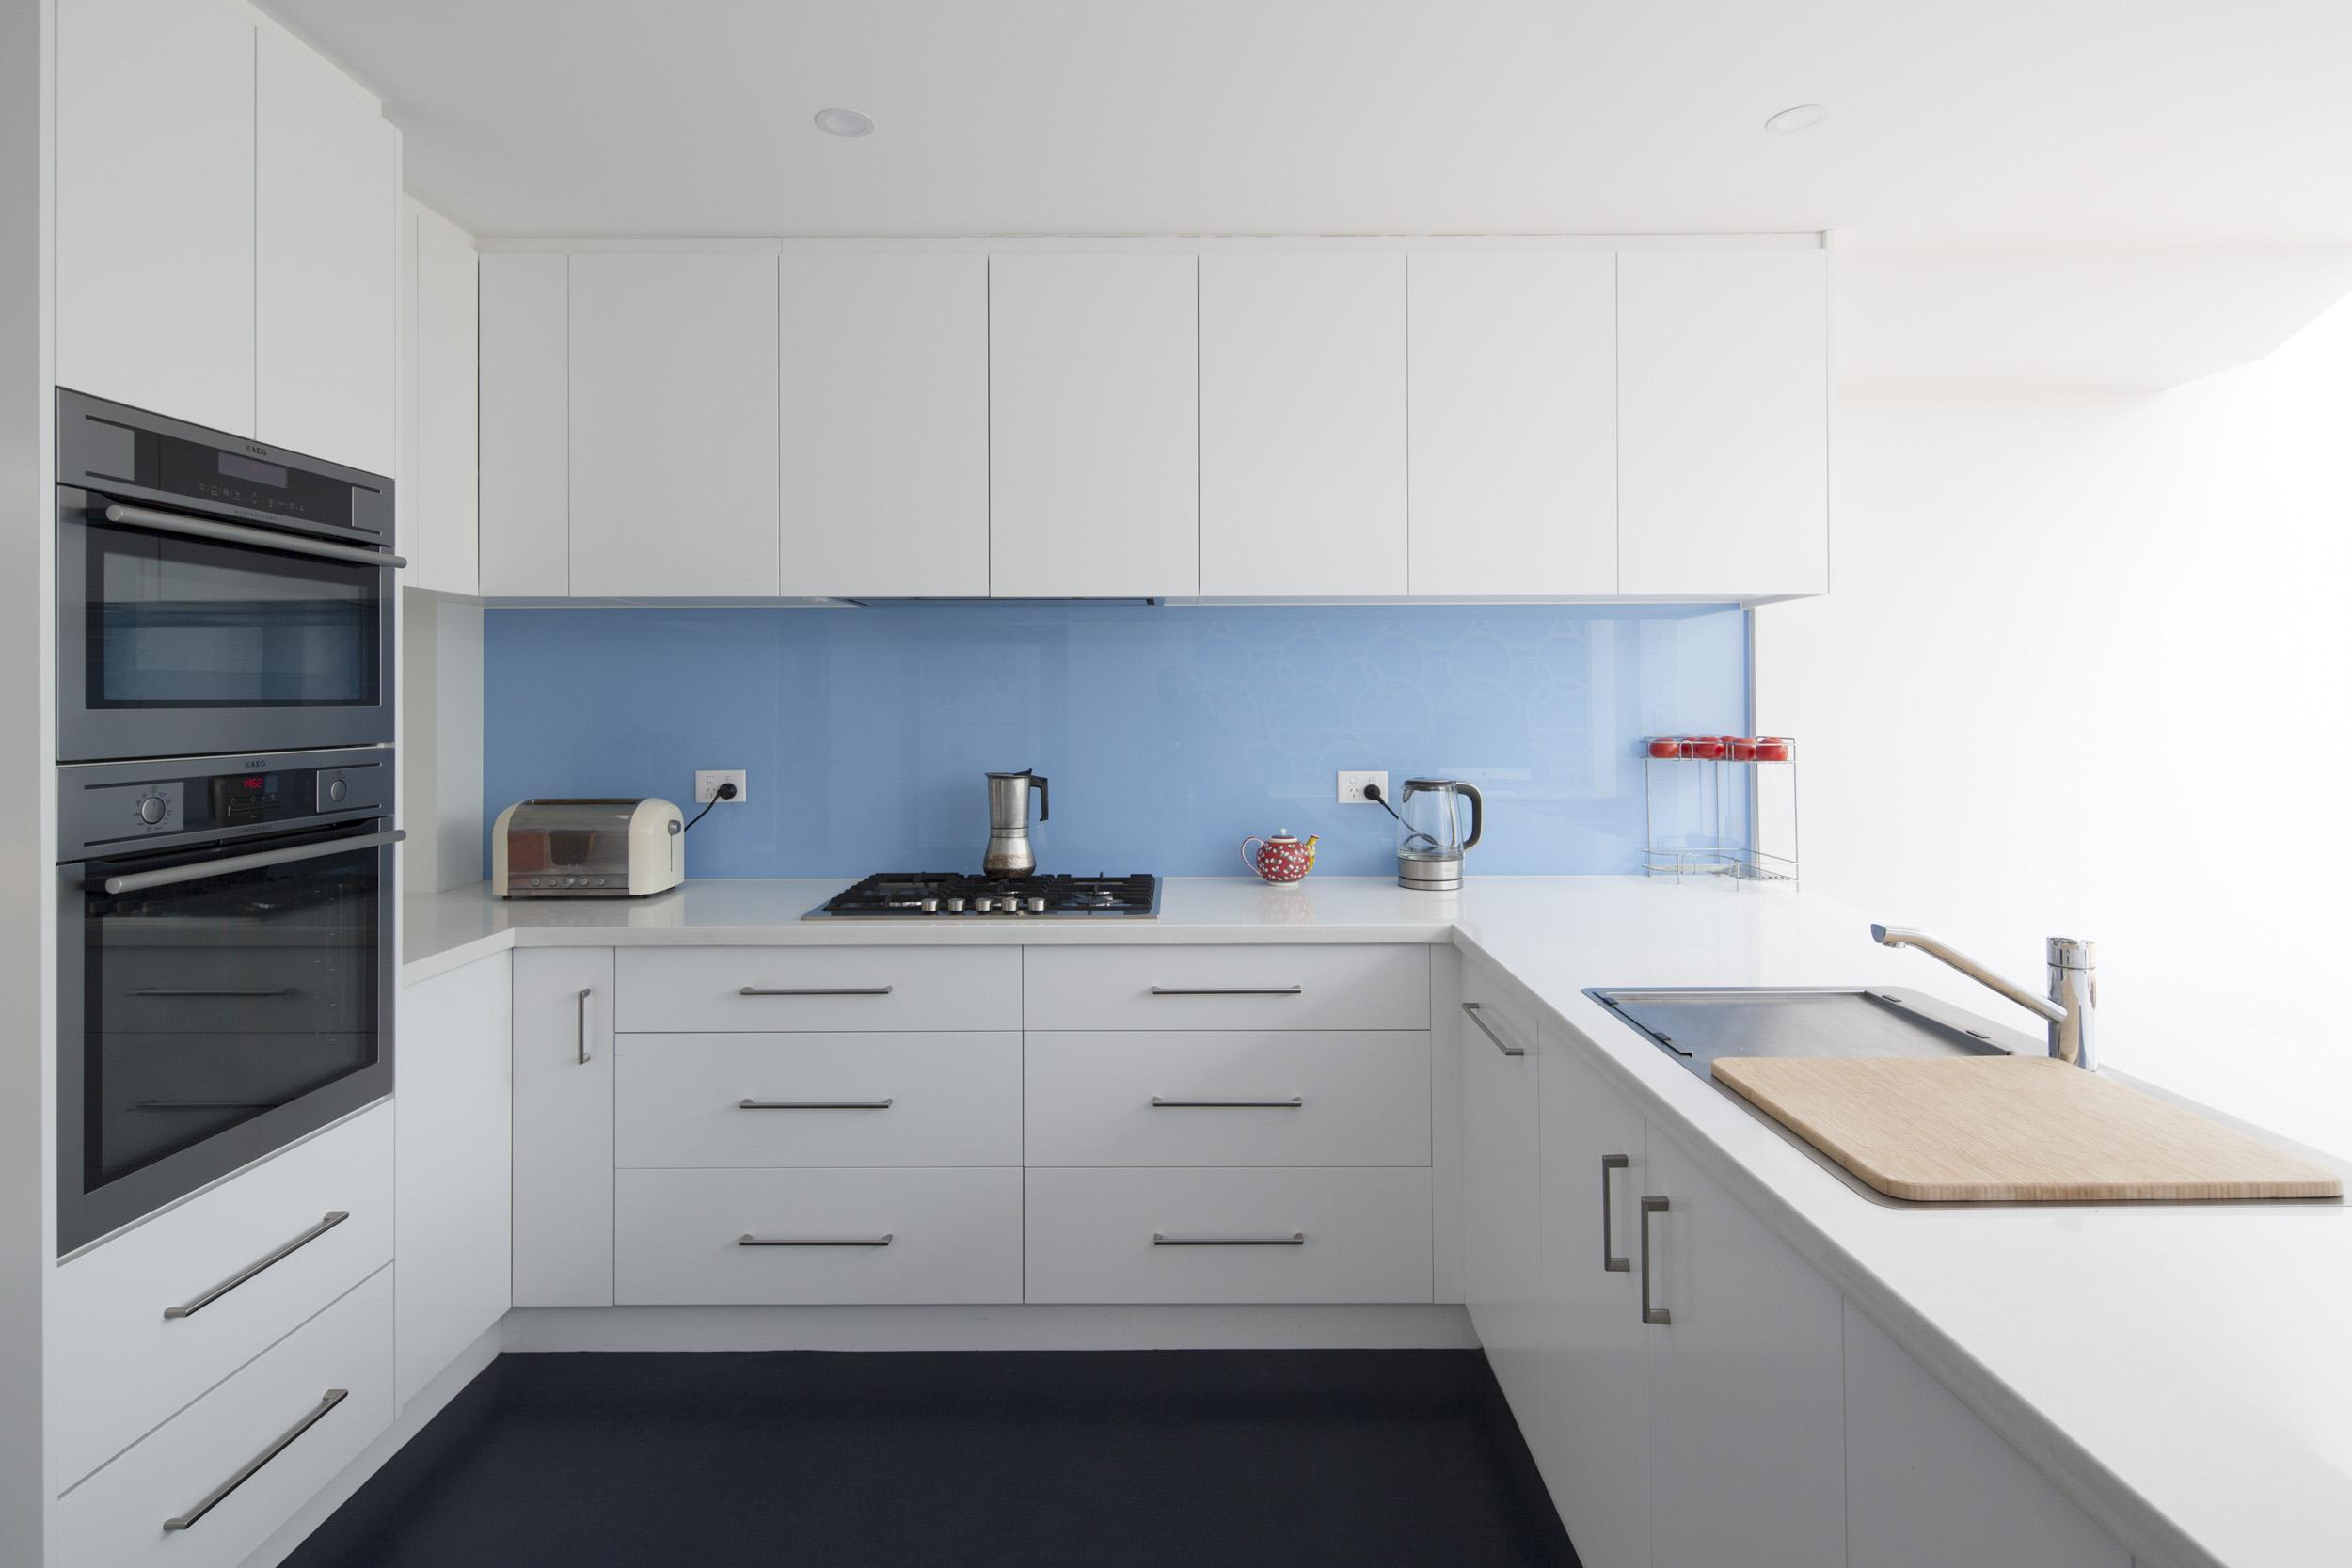 residential_architecture_sydney_australia_03.jpg